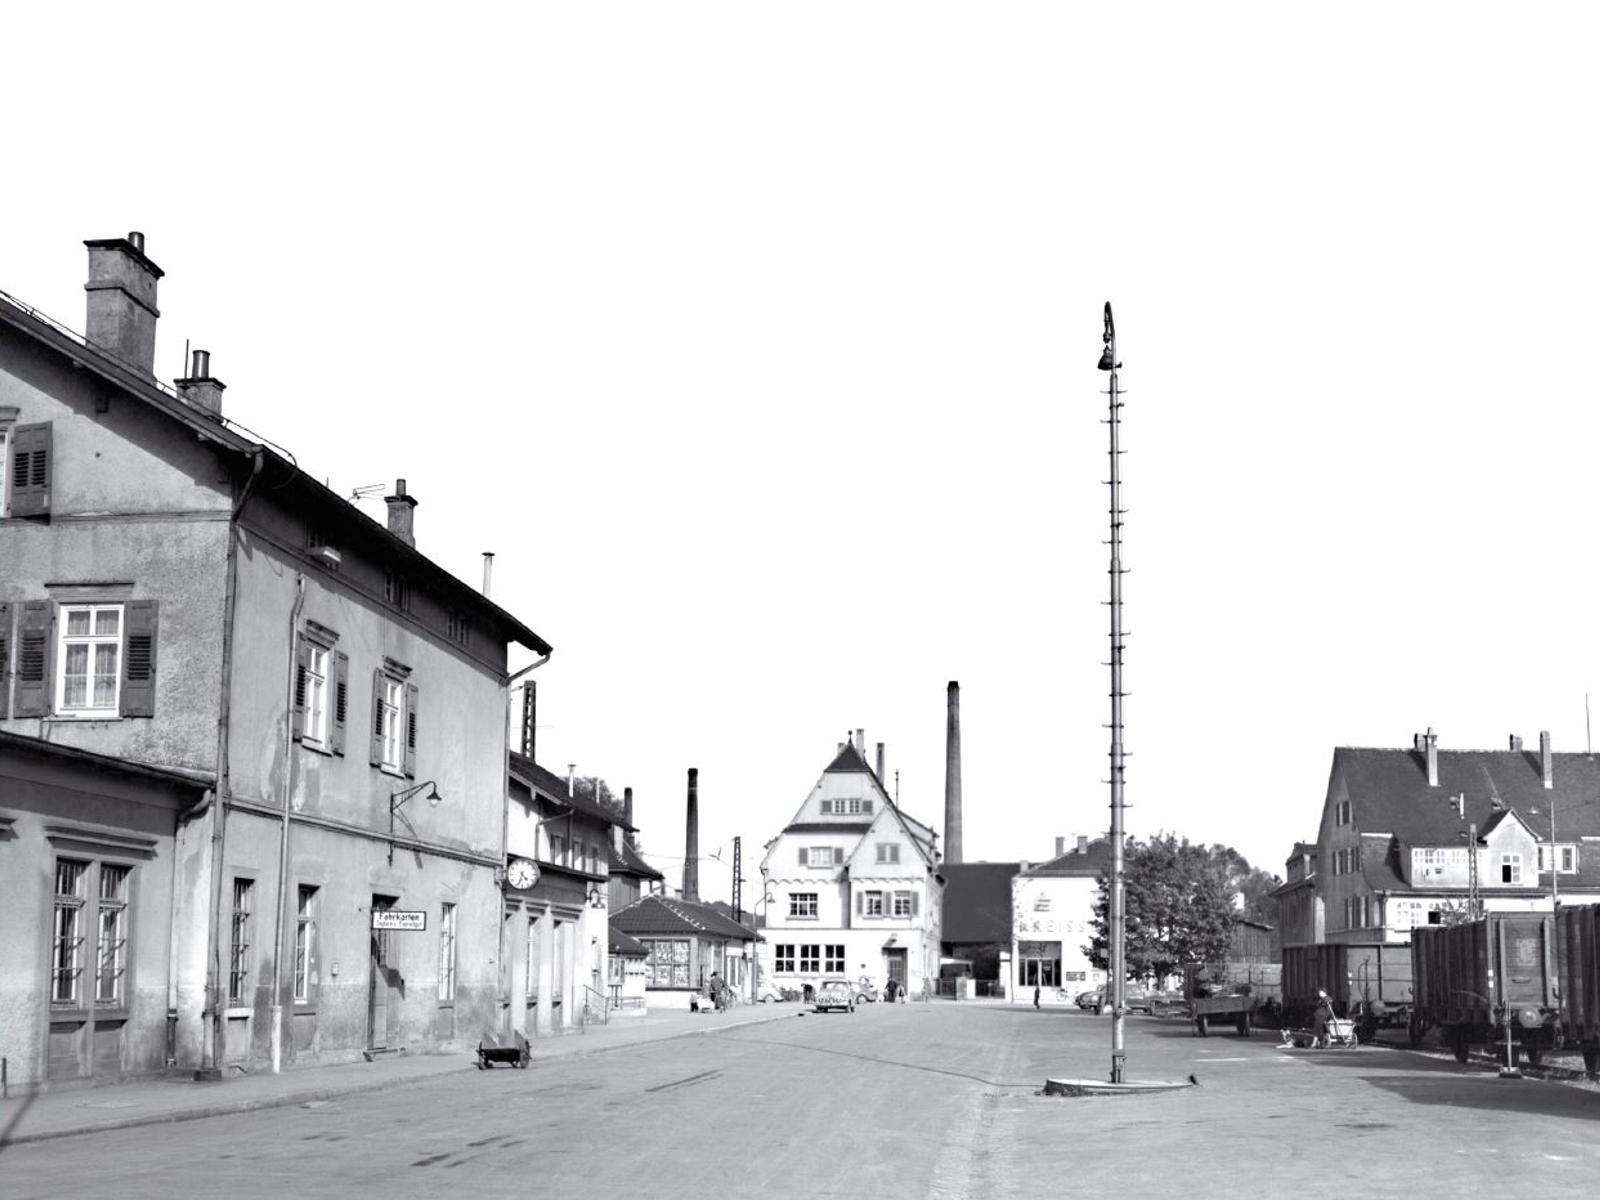 Station 2: Eisenbahn